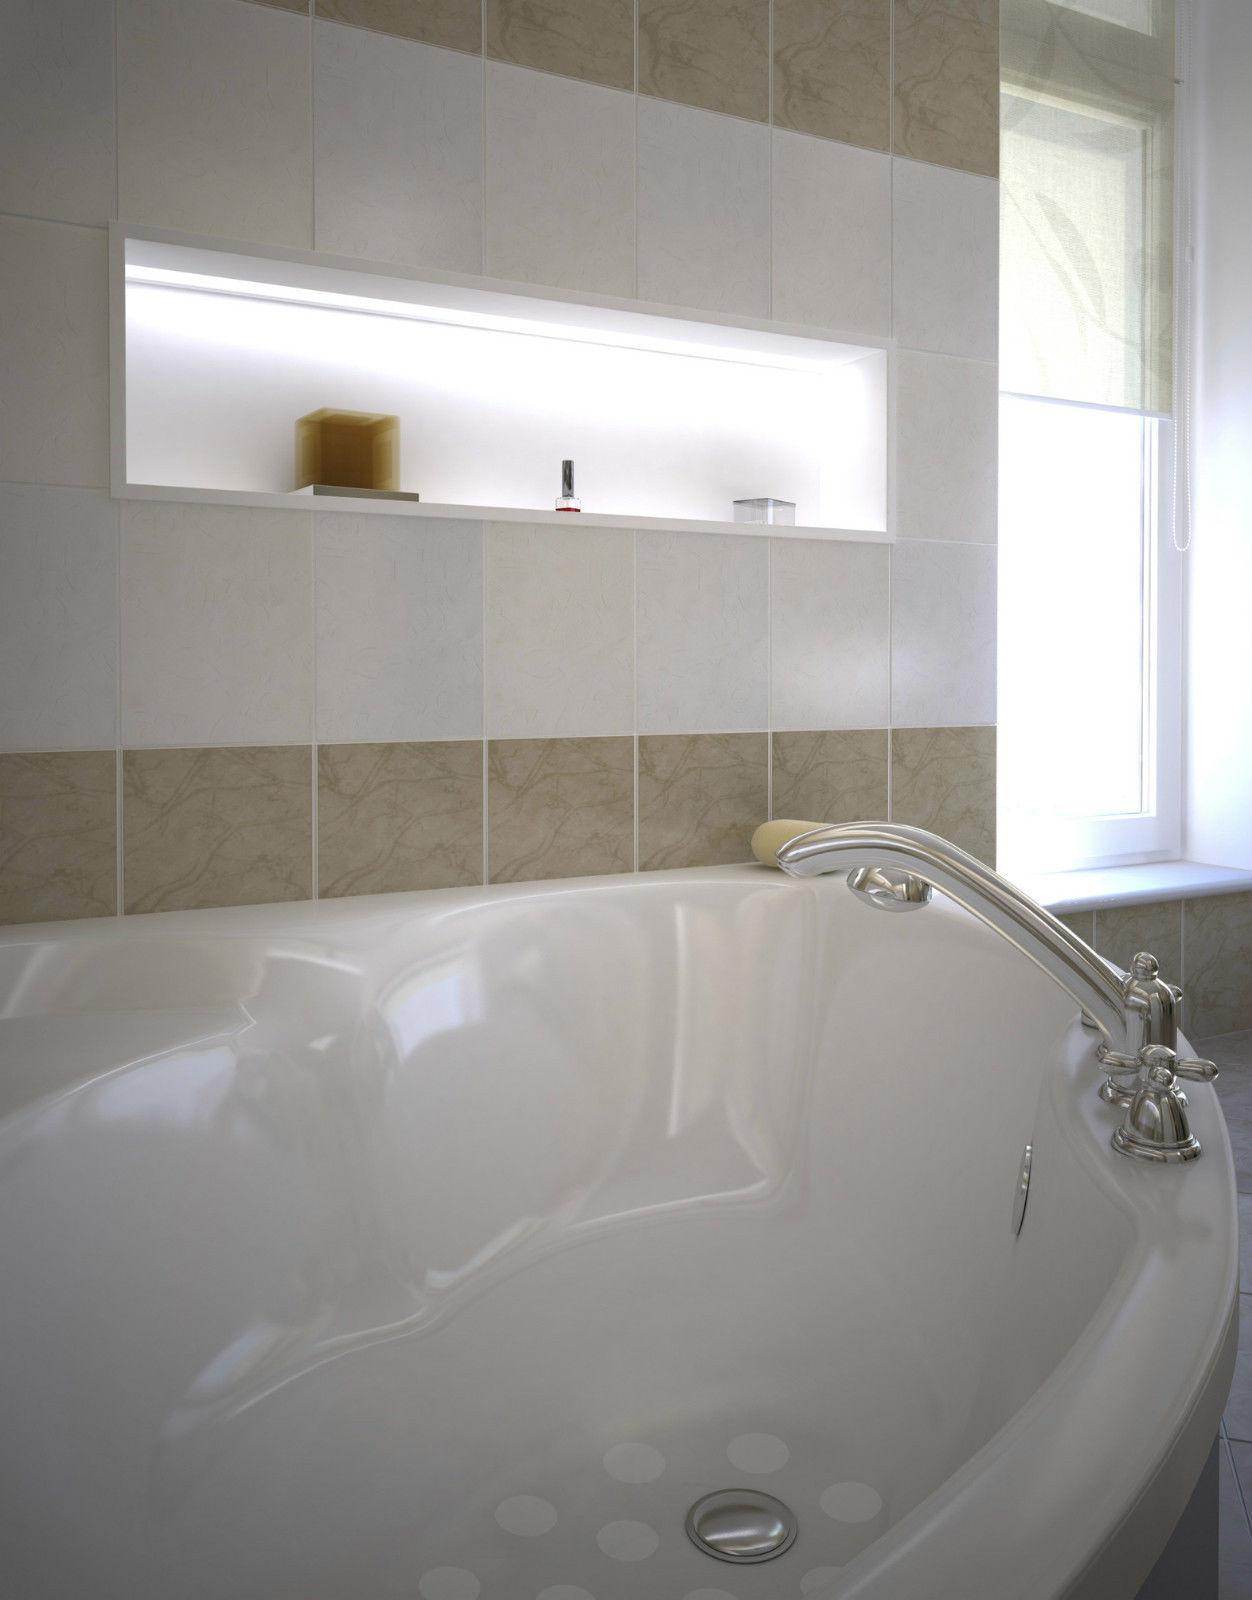 folie dusche. Black Bedroom Furniture Sets. Home Design Ideas